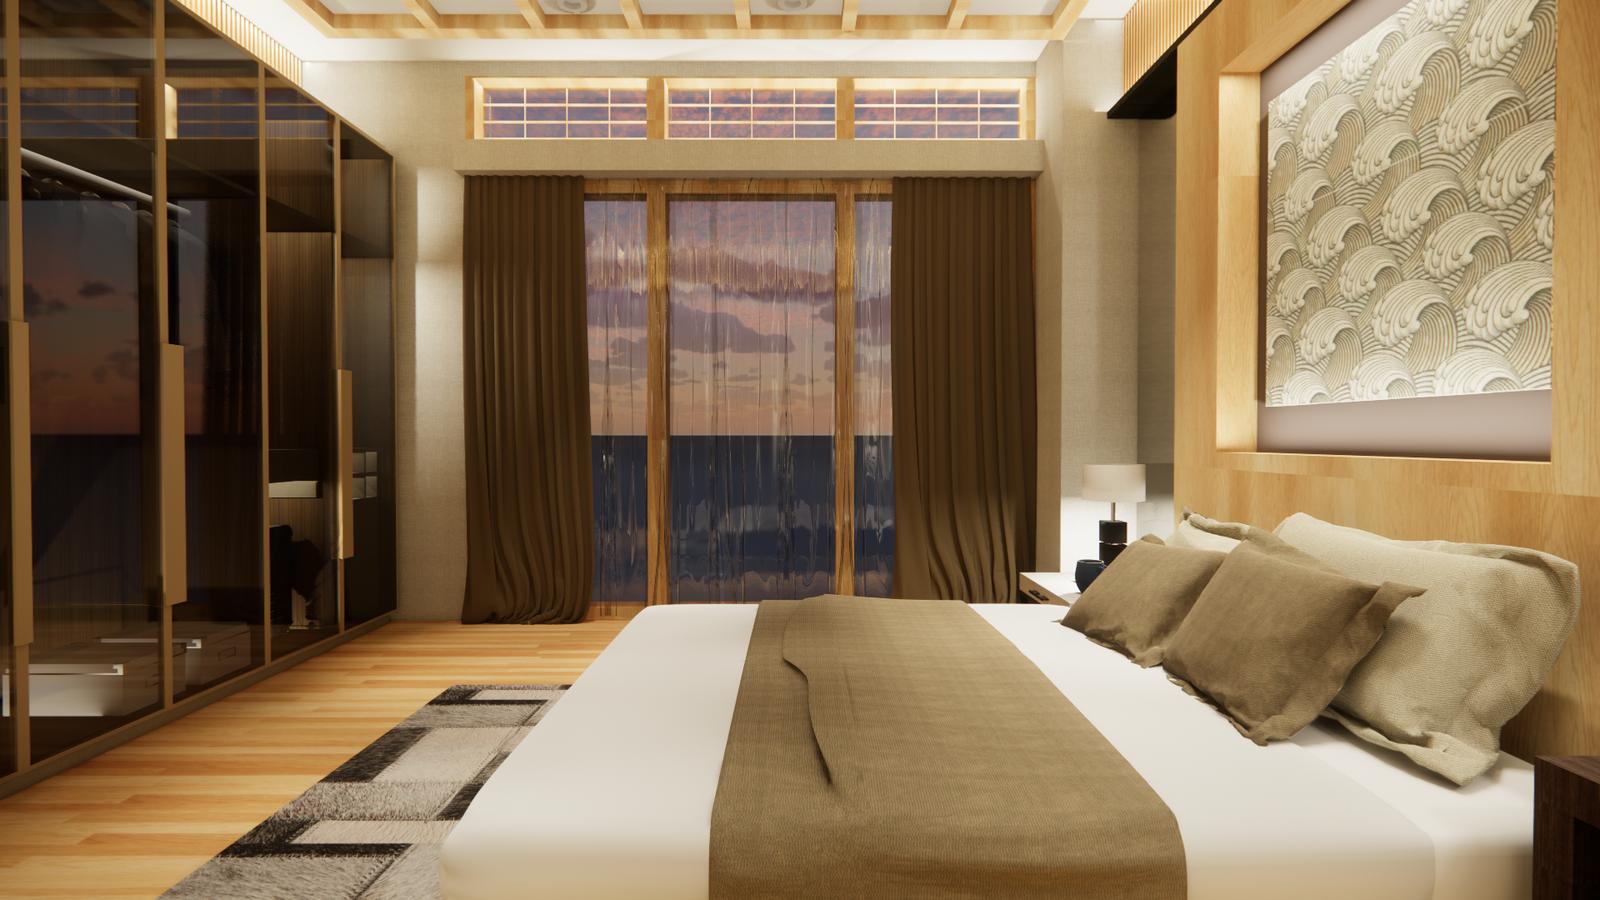 Naniwa Senior Living Center - Apartment Unit's Bedroom 1